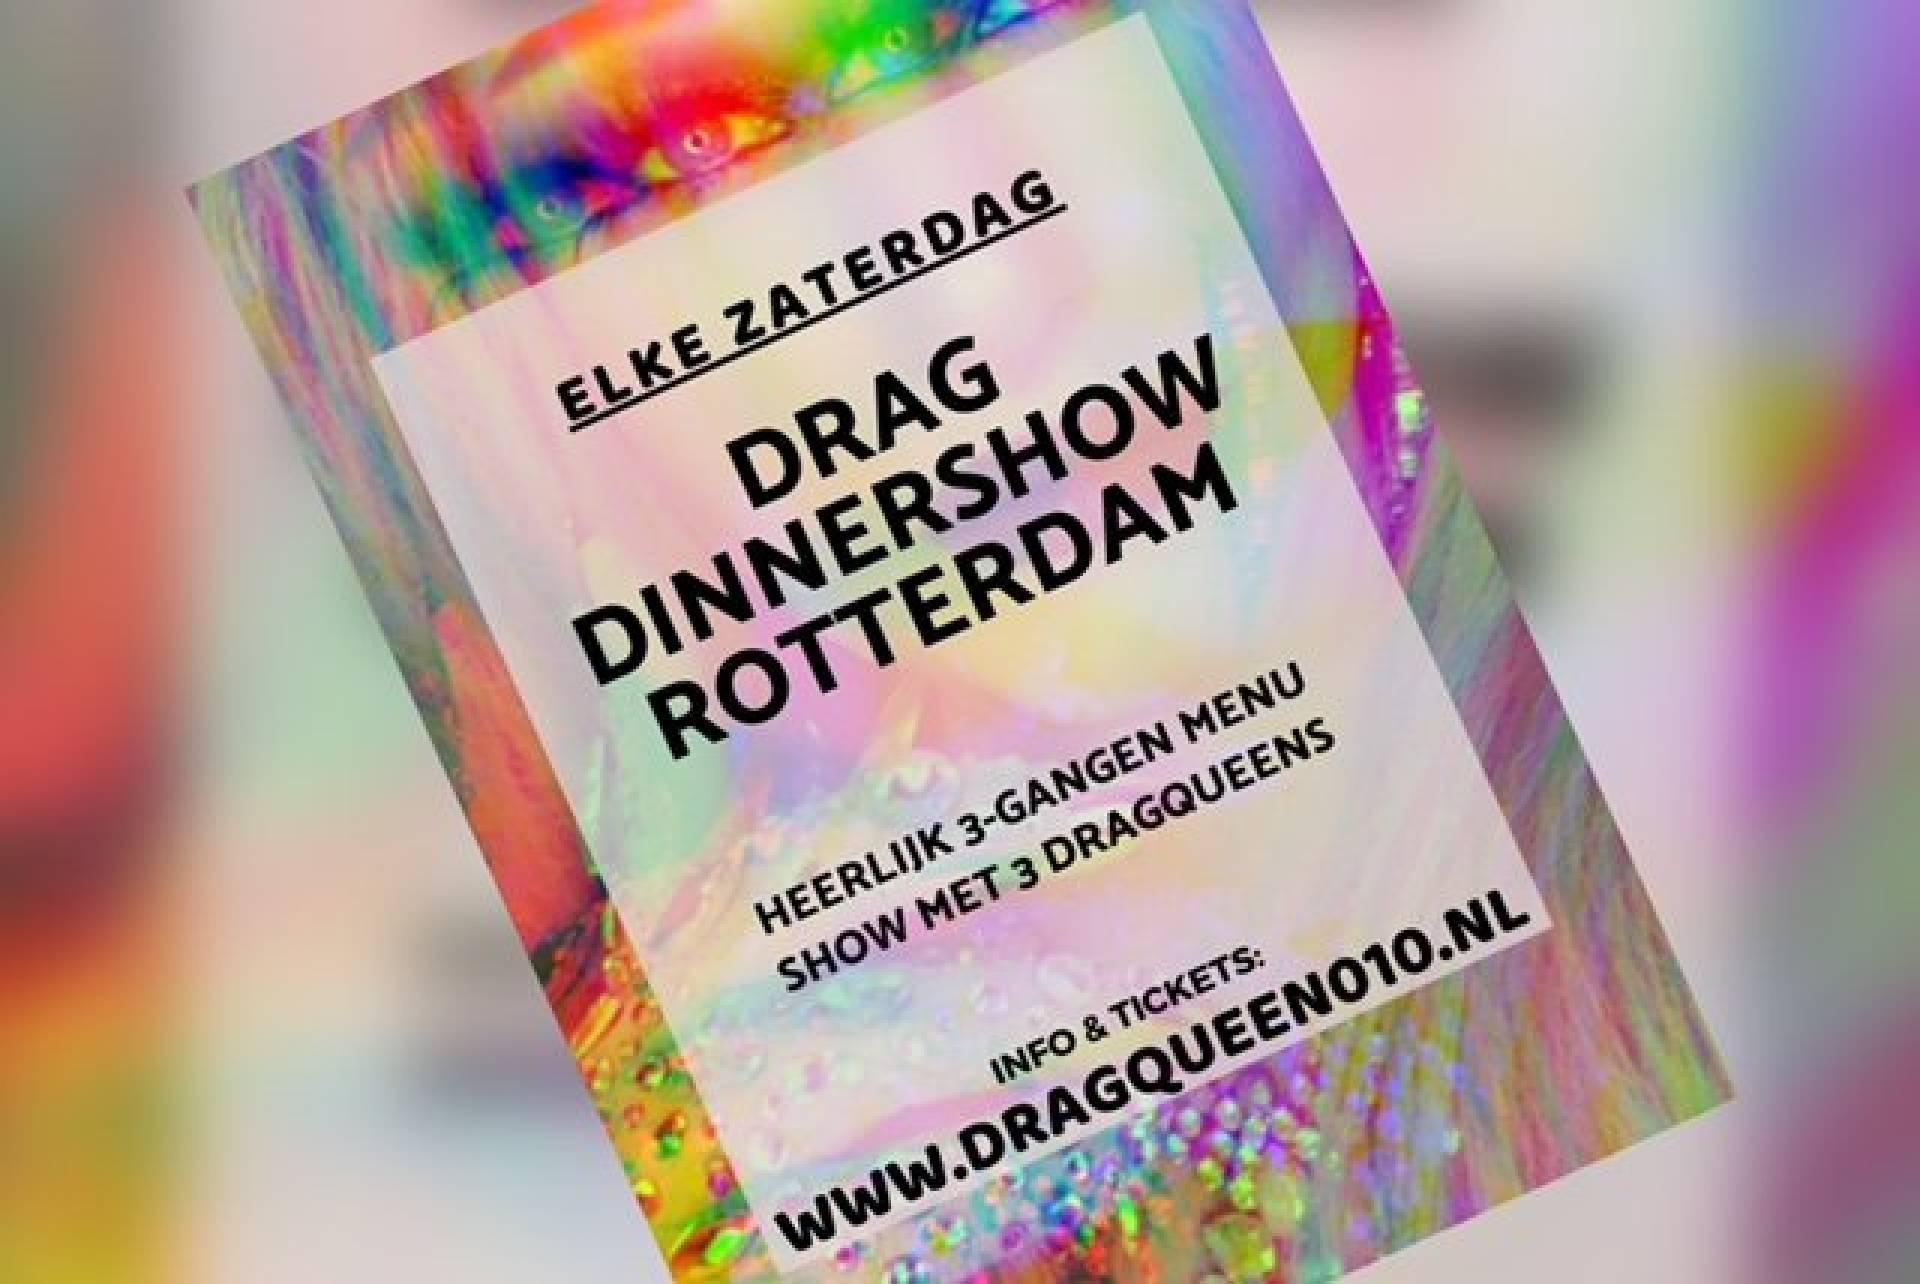 Drag Dinner Show Rotterdam